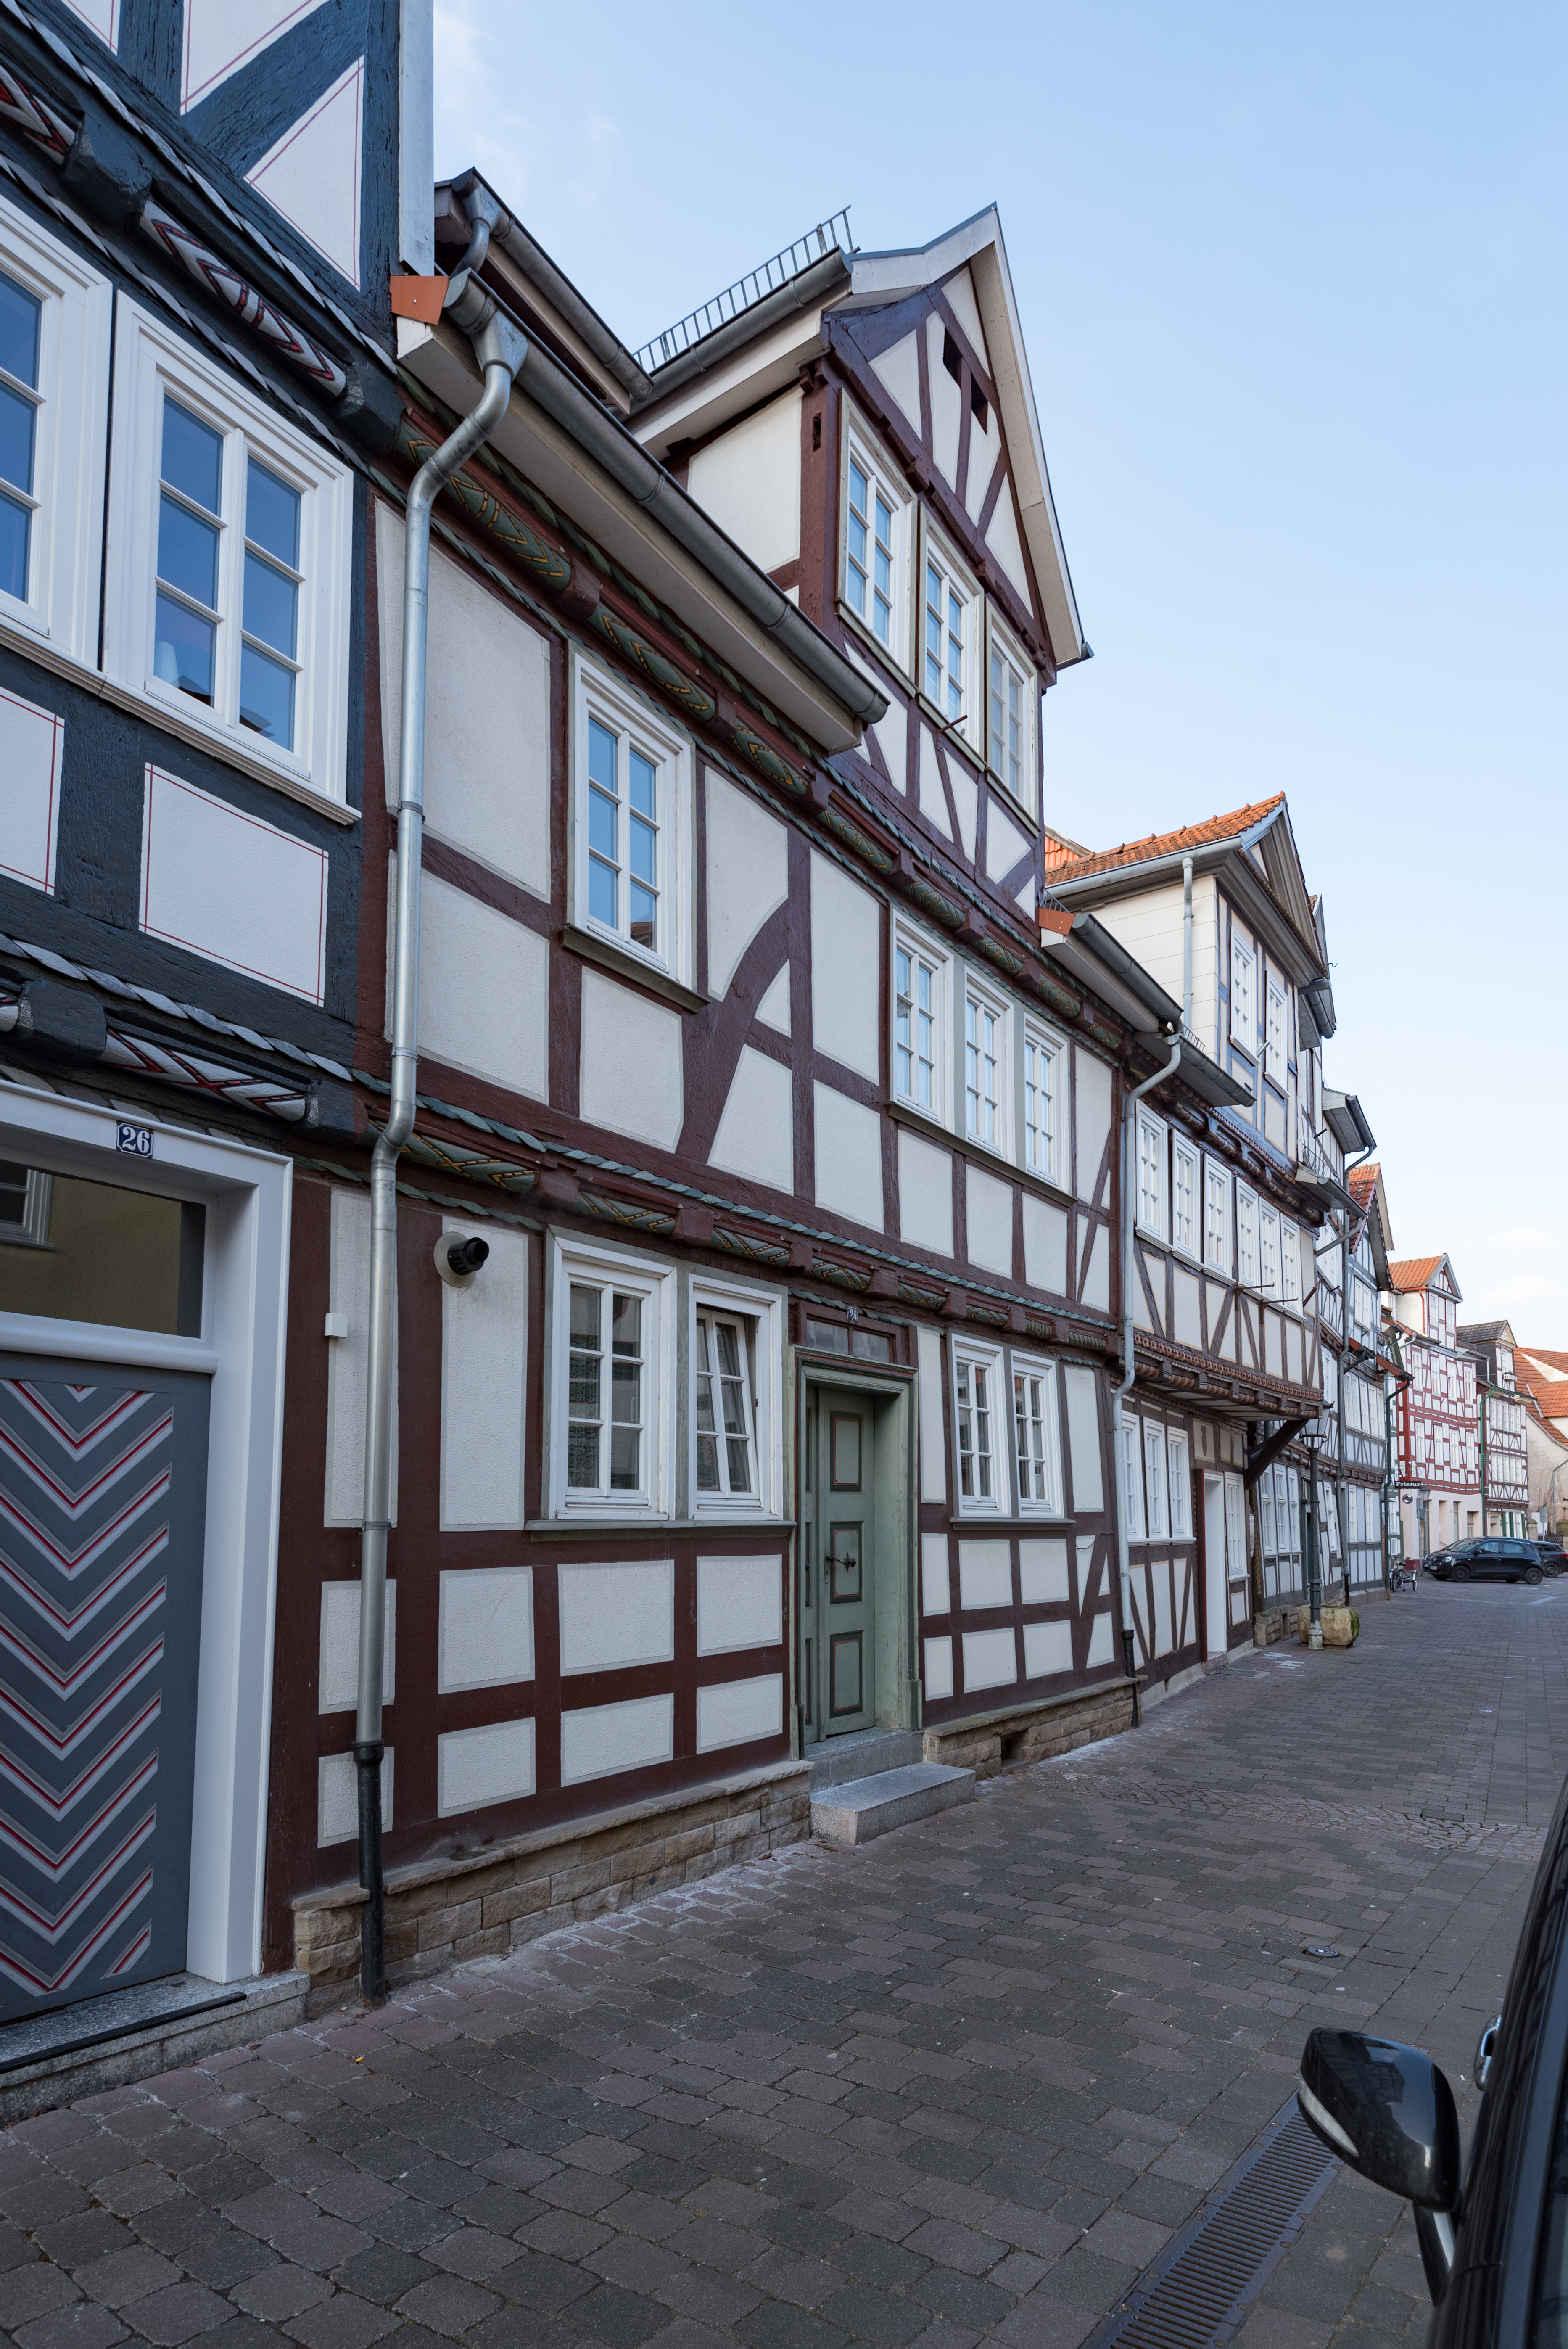 Dateibrotgasse 24 Rotenburg An Der Fulda 20180223 001jpg Wikipedia